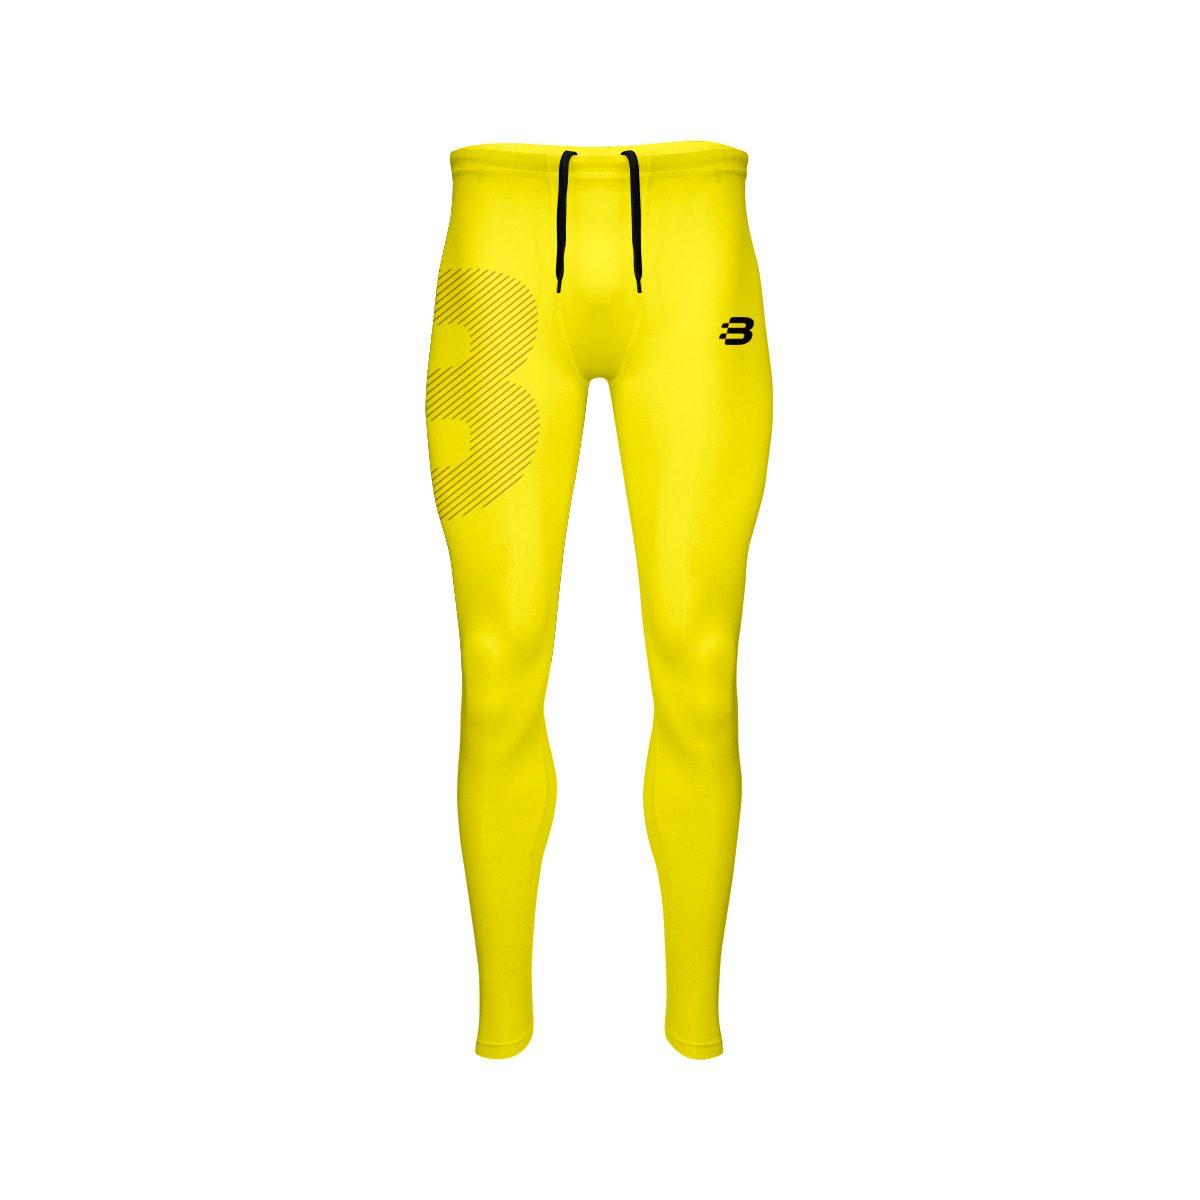 14e79b17fe Mens Compression Tights - Yellow - Blackchrome